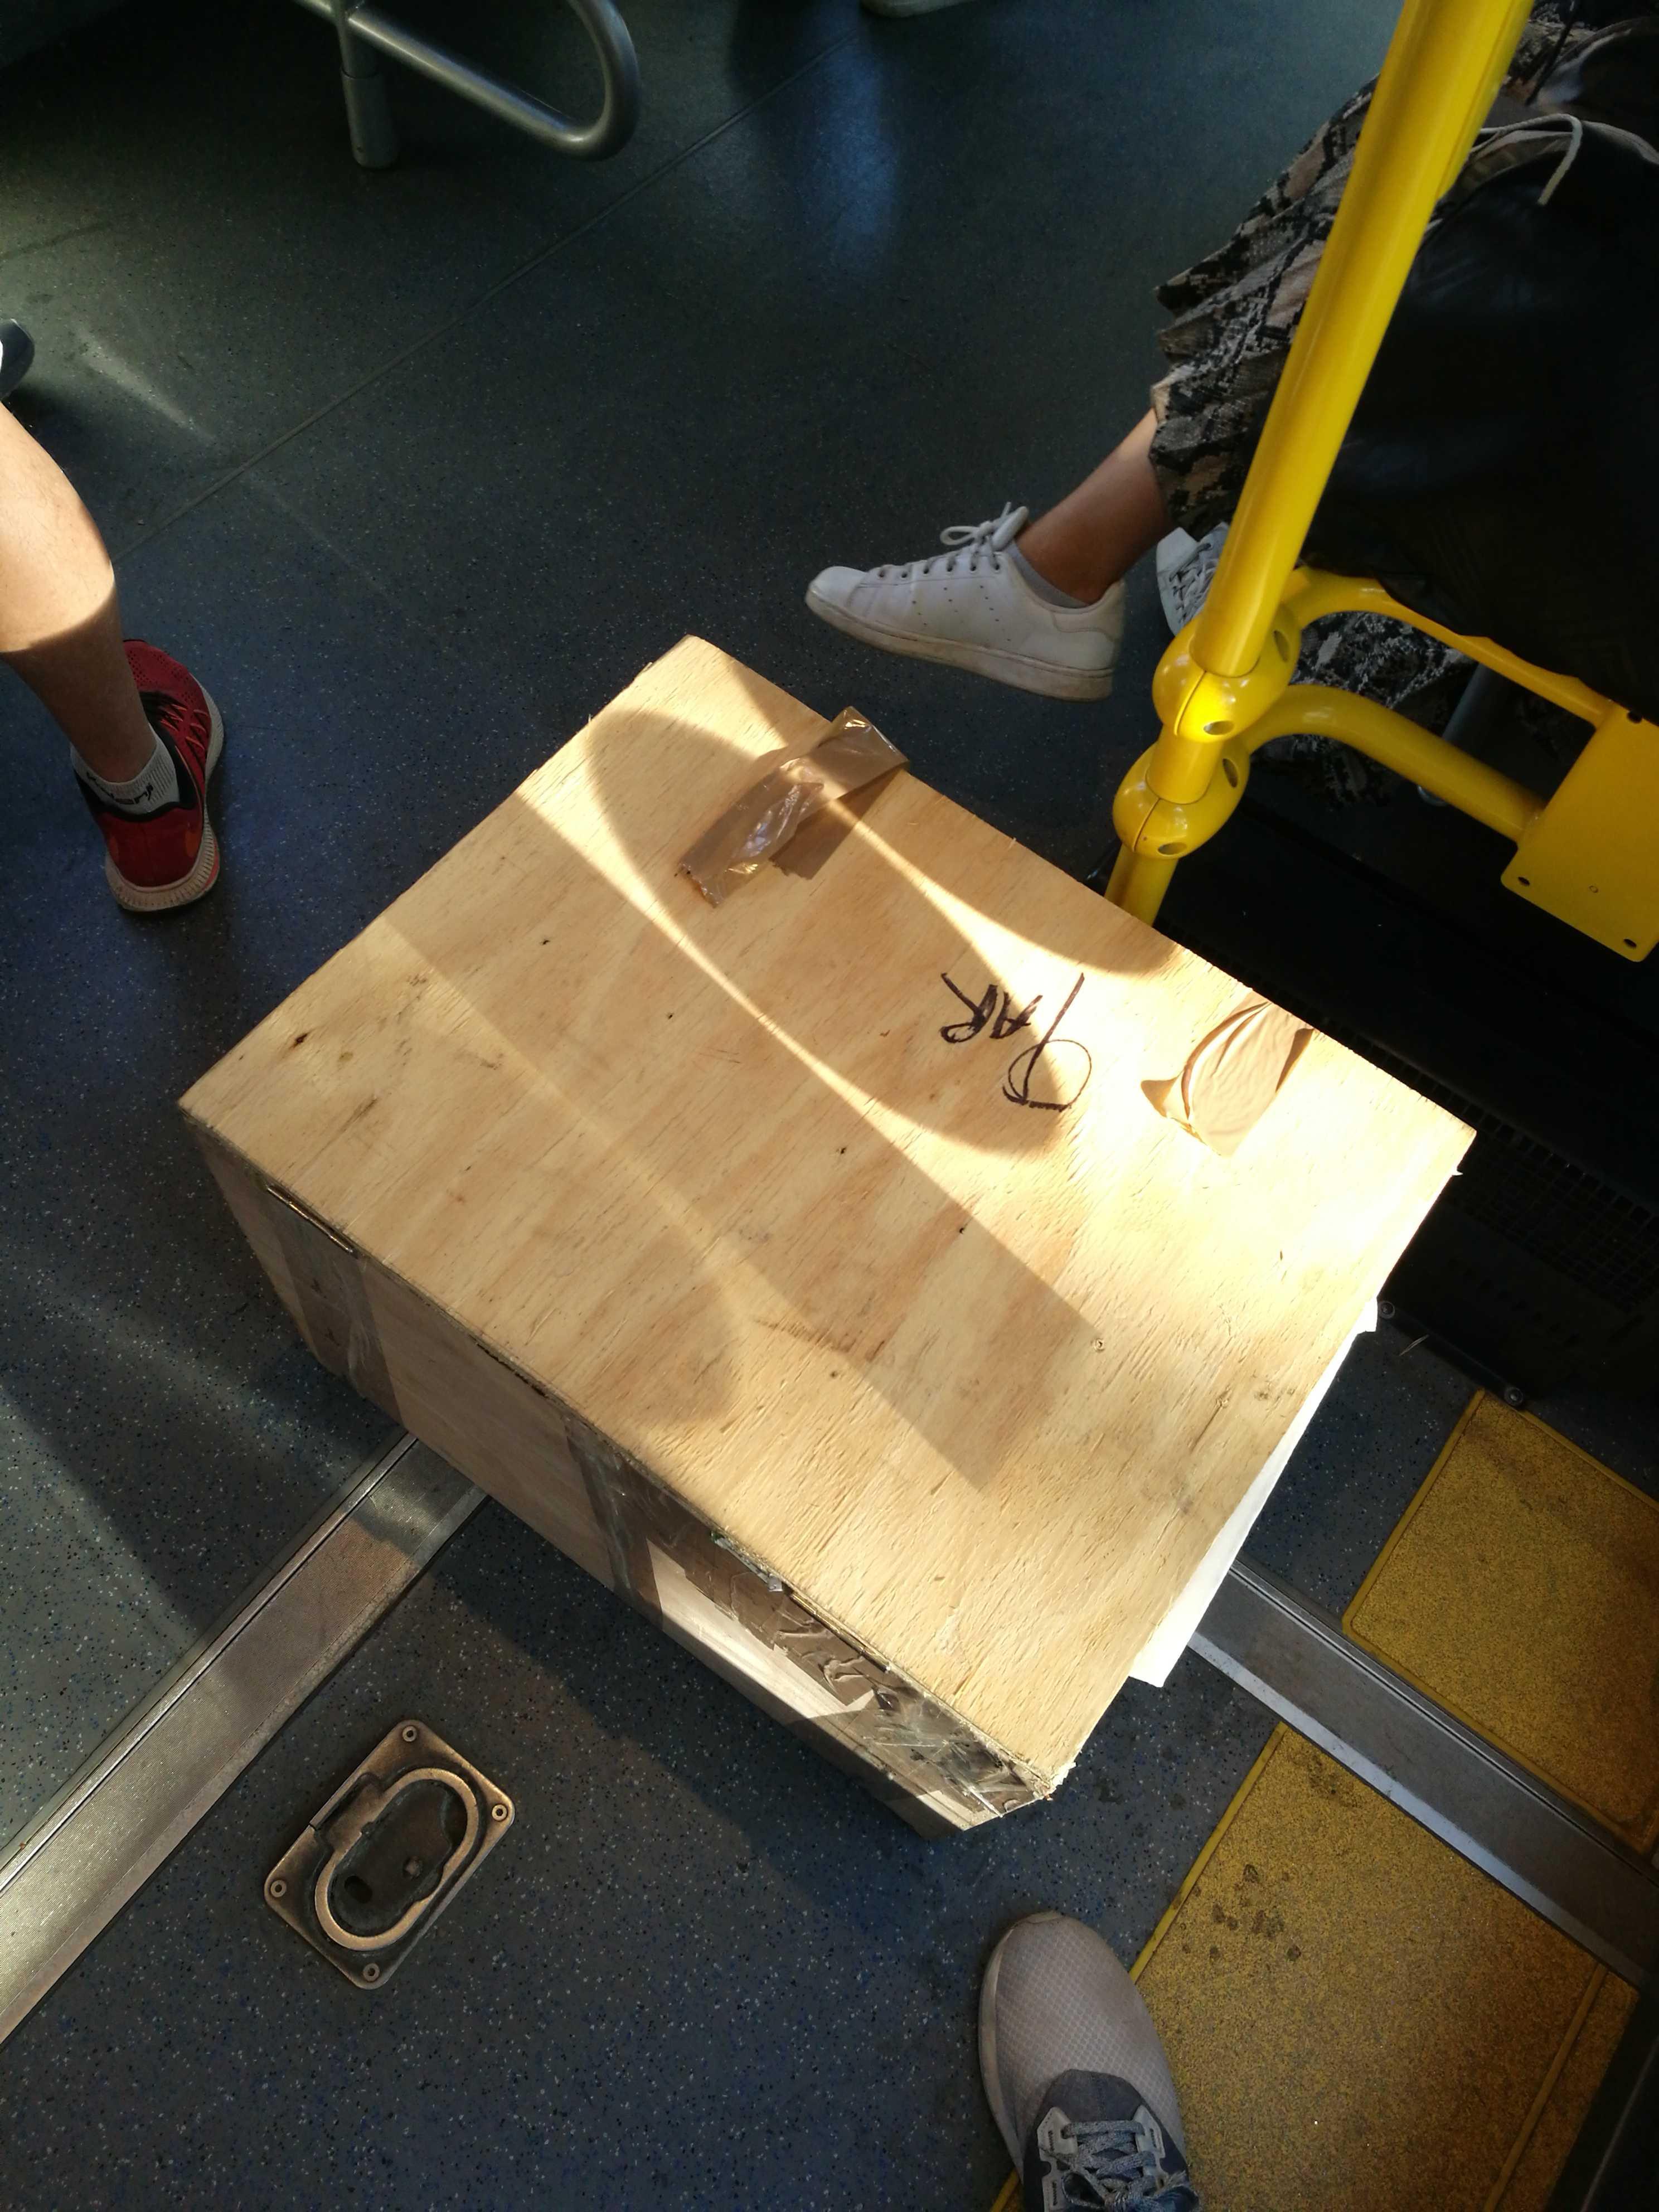 ecogarden in a box